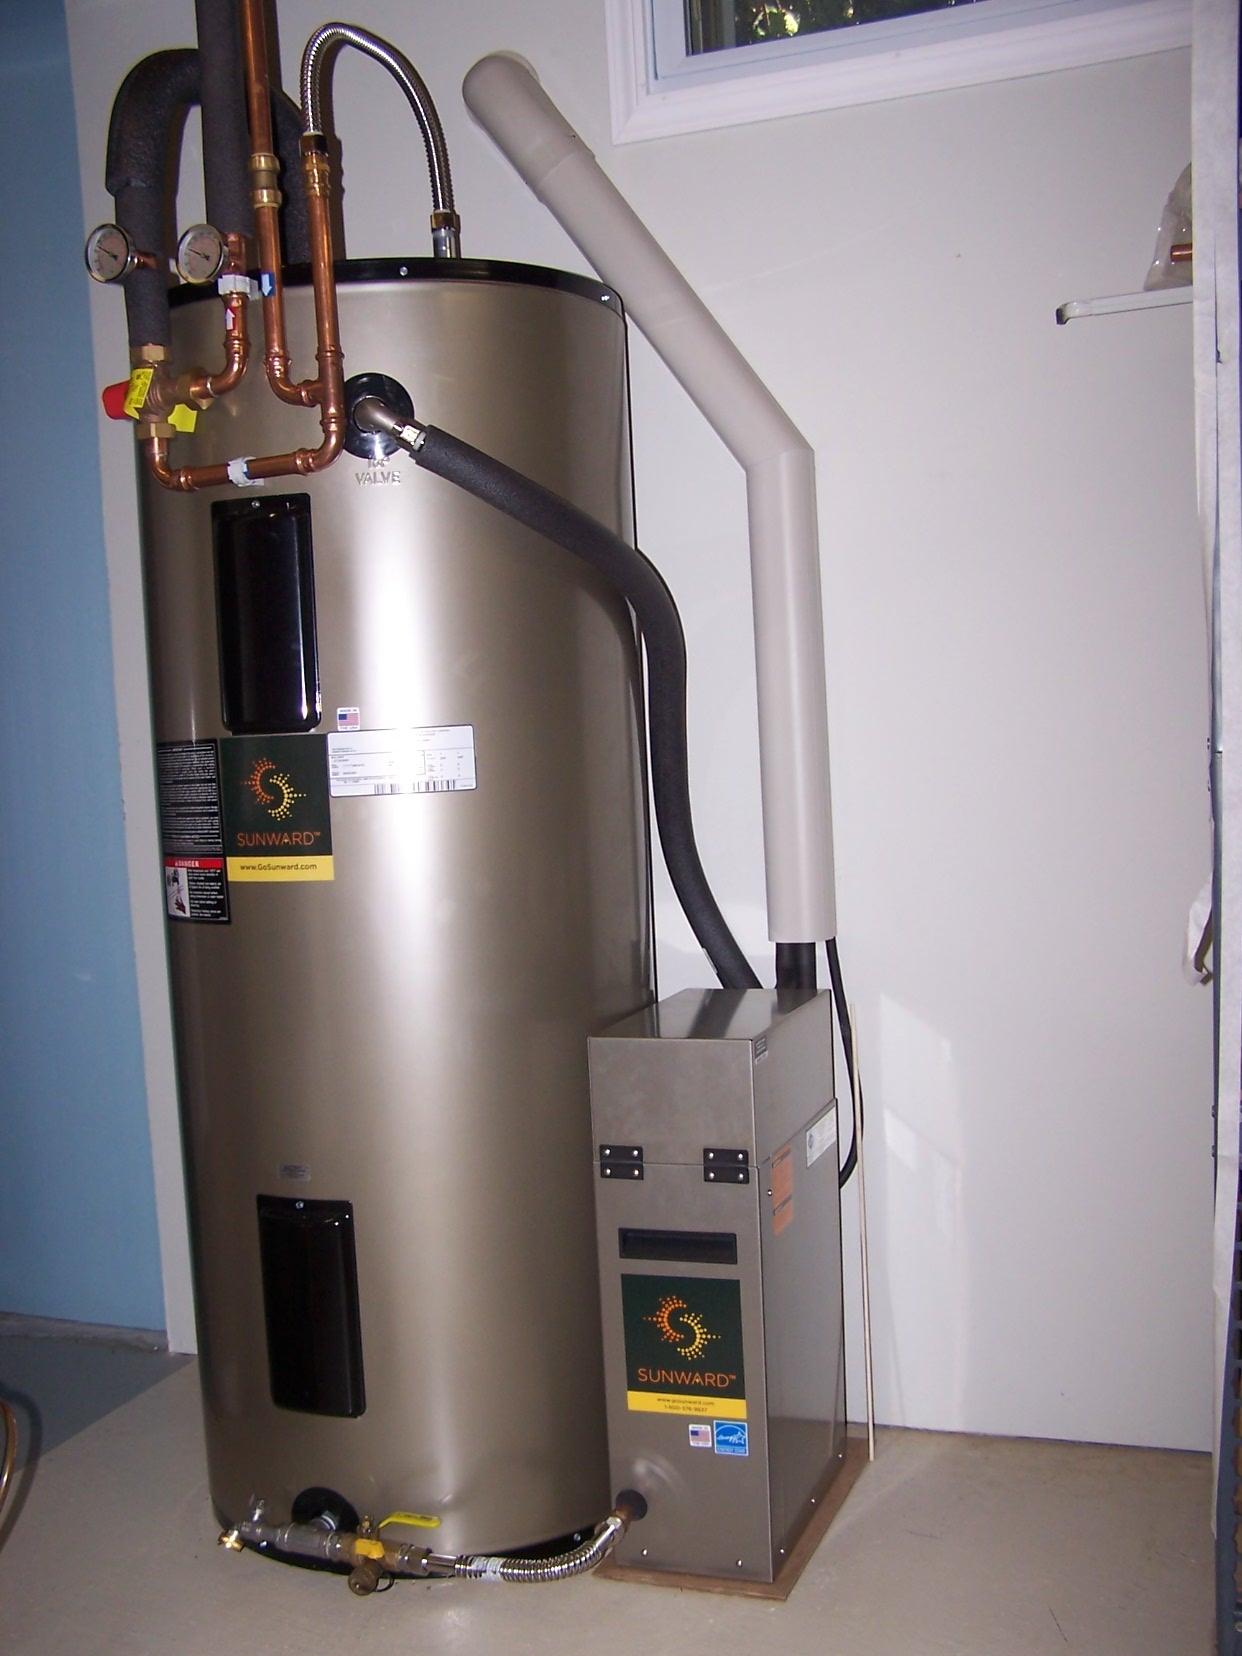 Sunward Solar Hot Water System Marietta Ny Energysage